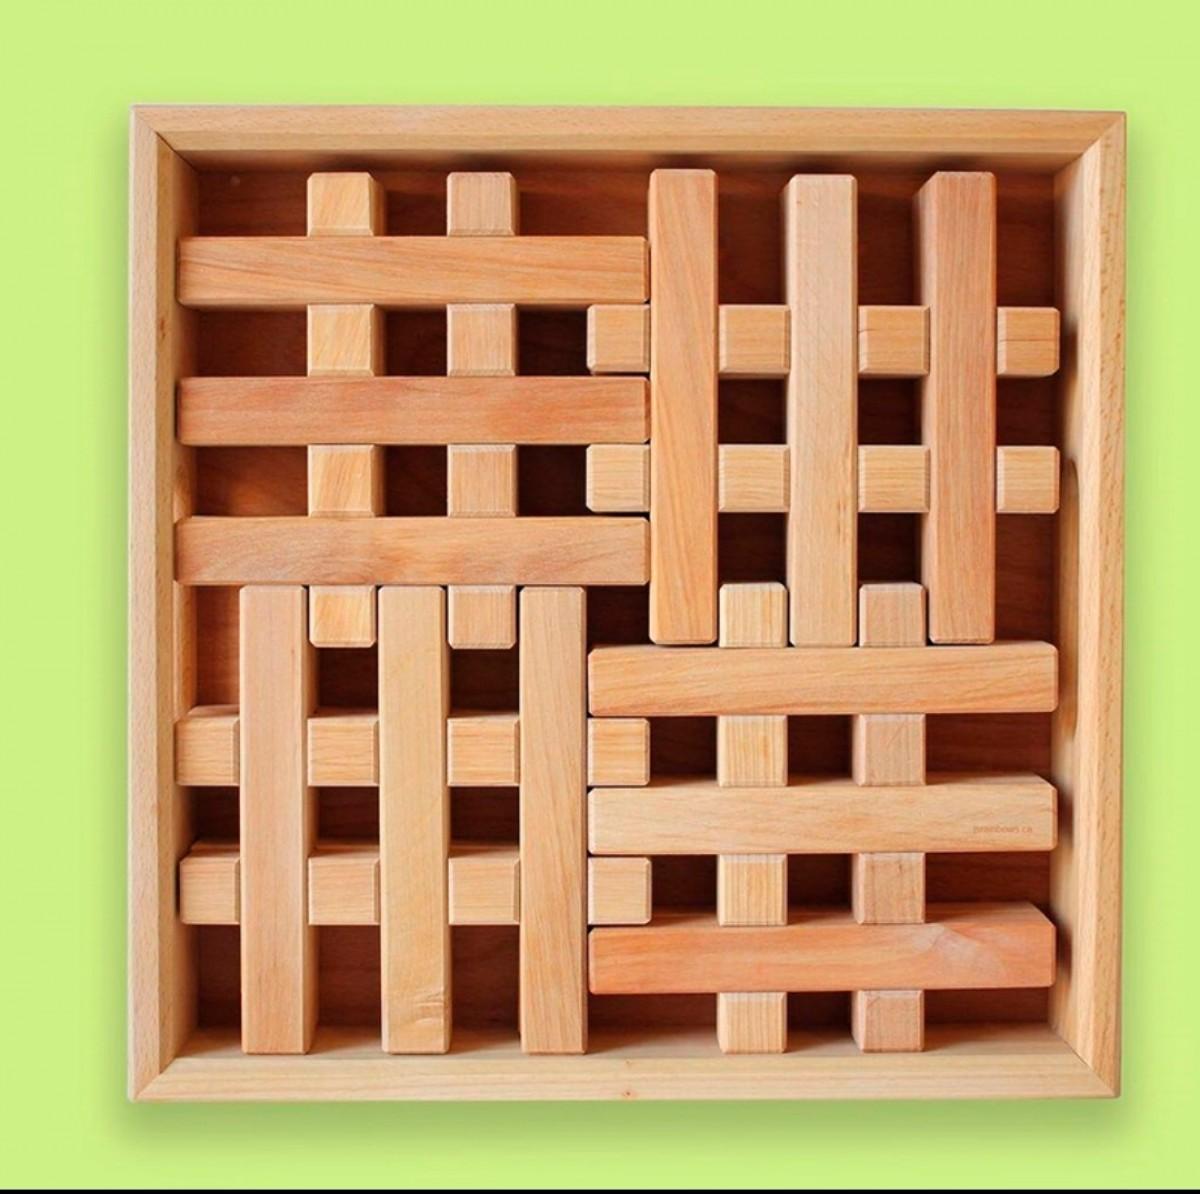 Grid Blocks (8 pcs) *Eta 4 weeks * - Petit World